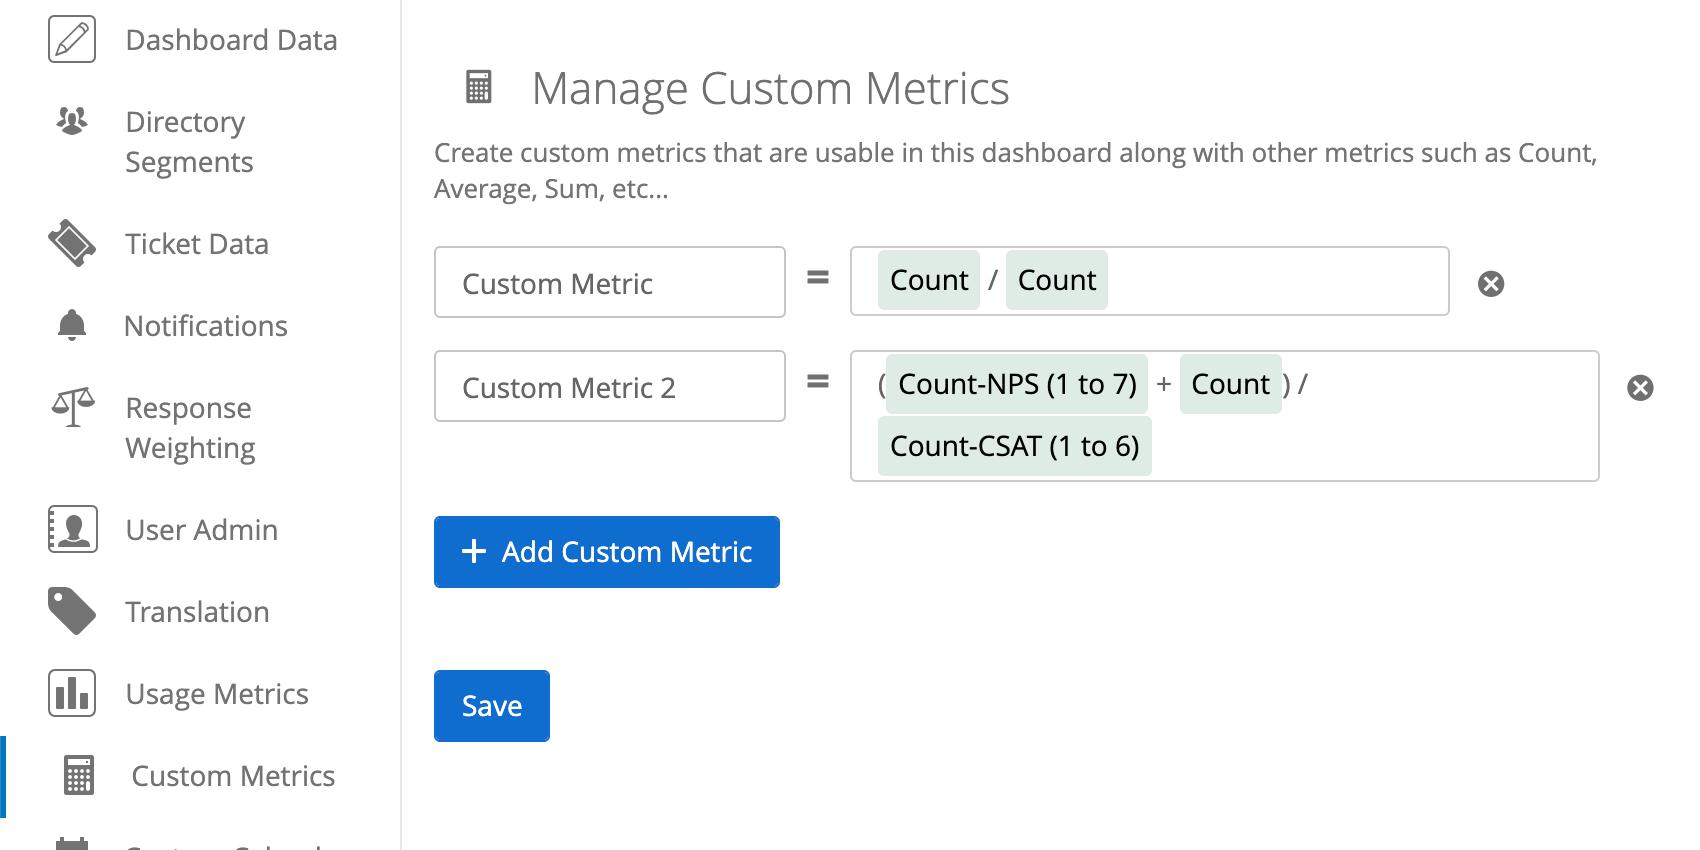 Custom metrics as described